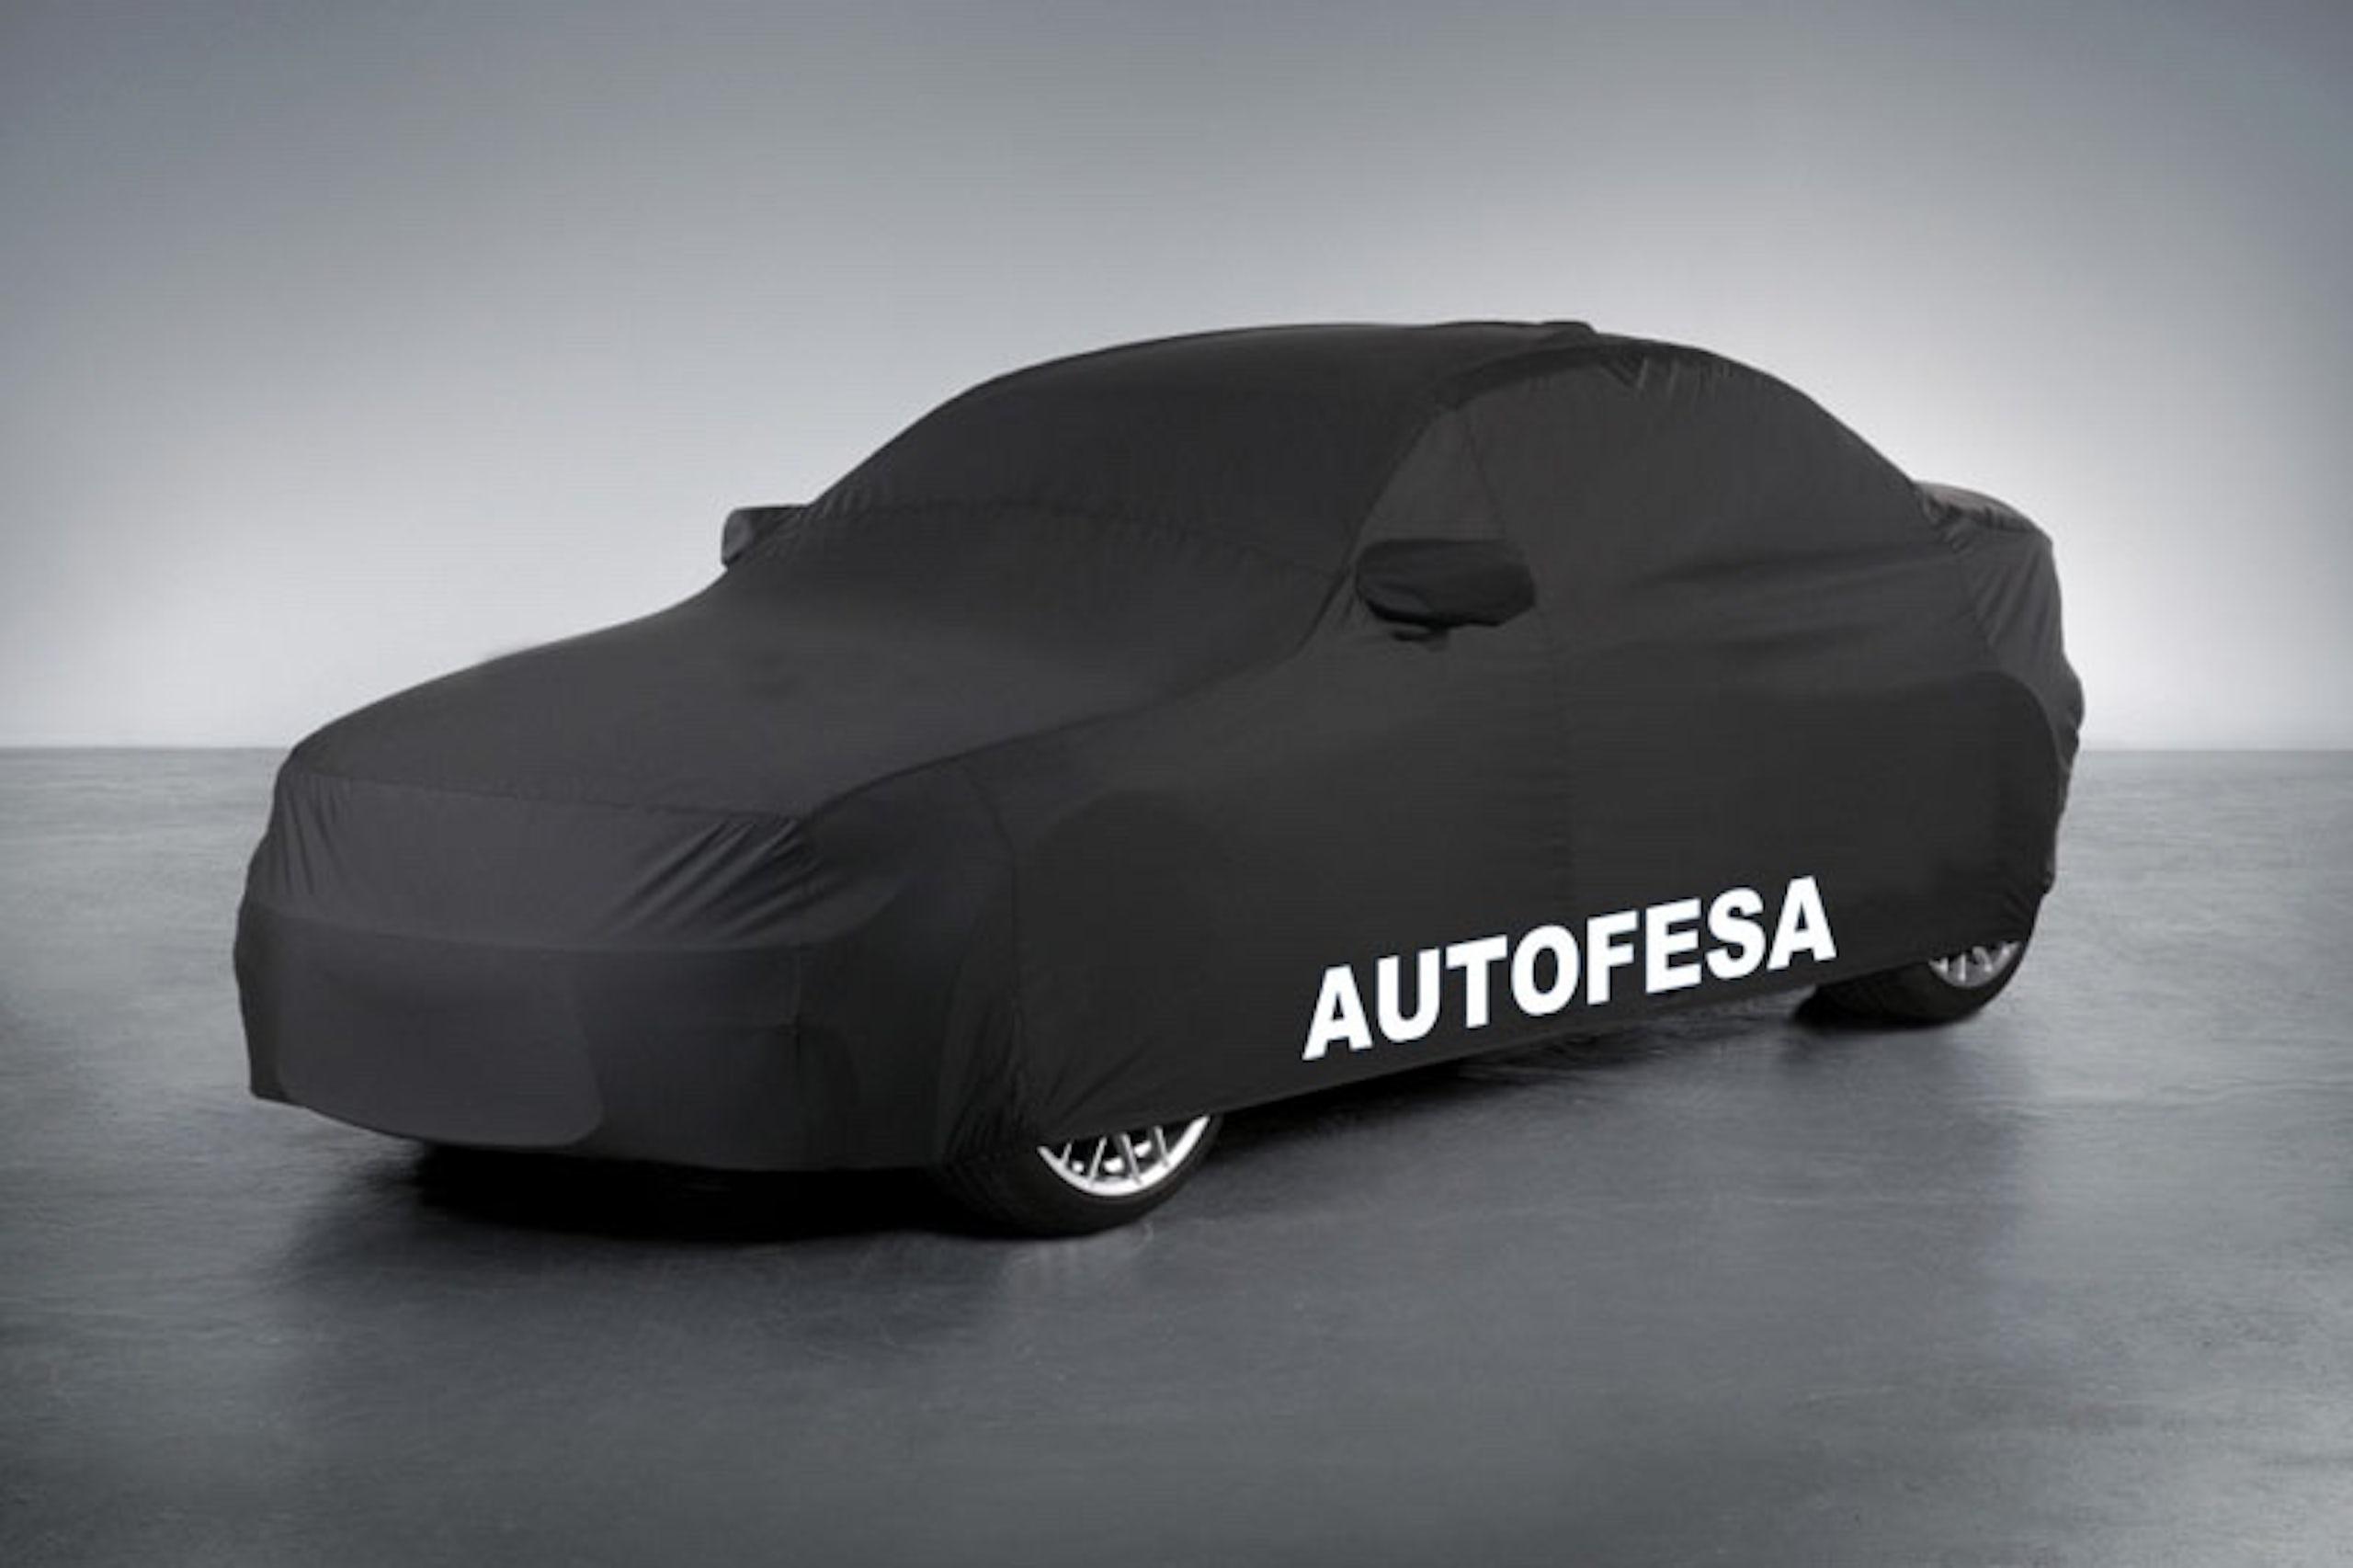 Audi A6 A6 3.0 TDI AVANT 204cv quattro 5p S tronic Auto S/S - Foto 45